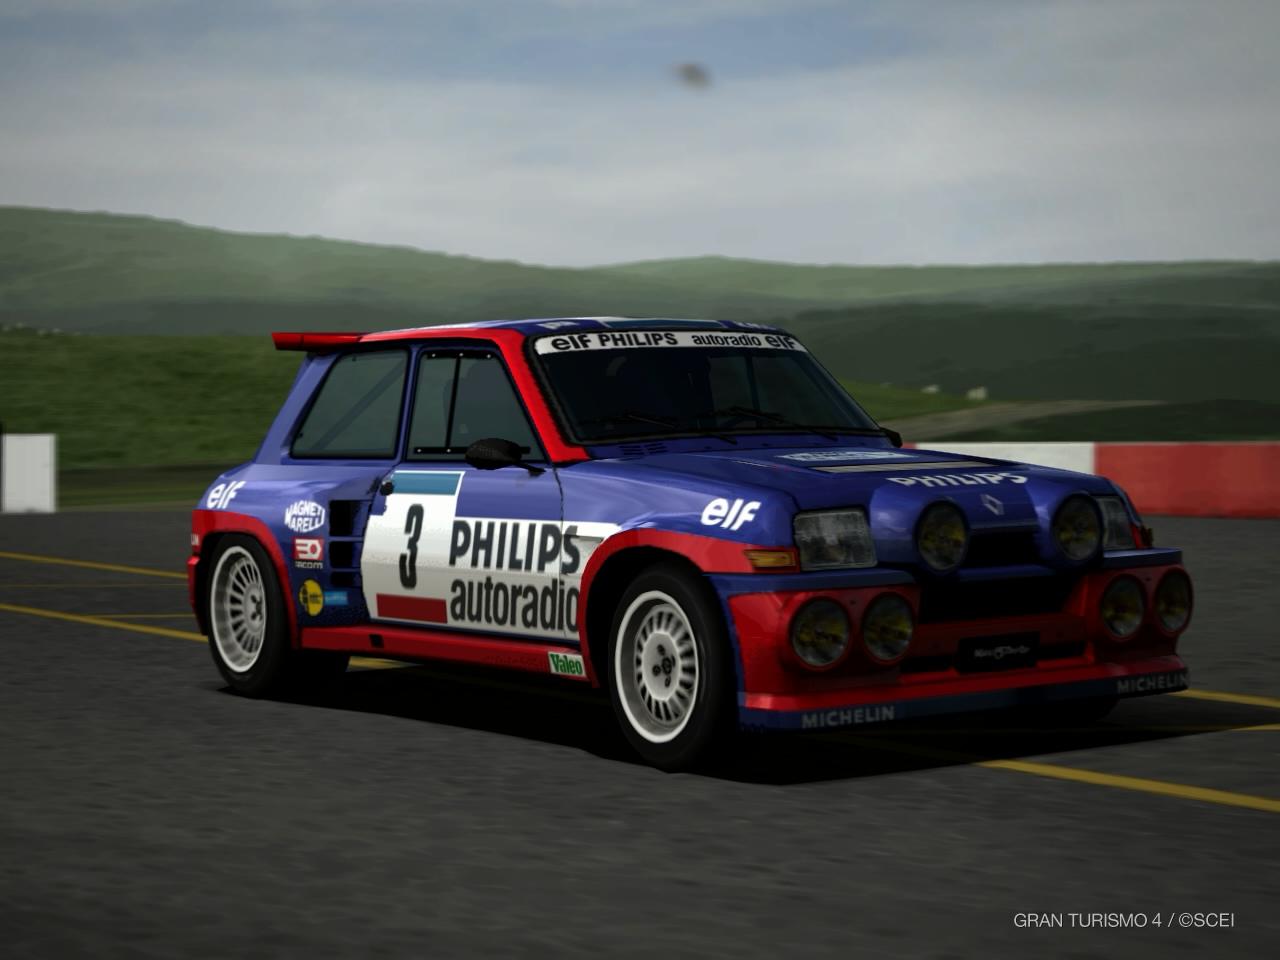 Renault 5 Maxi Turbo Rally Car 85 Gran Turismo Wiki Fandom